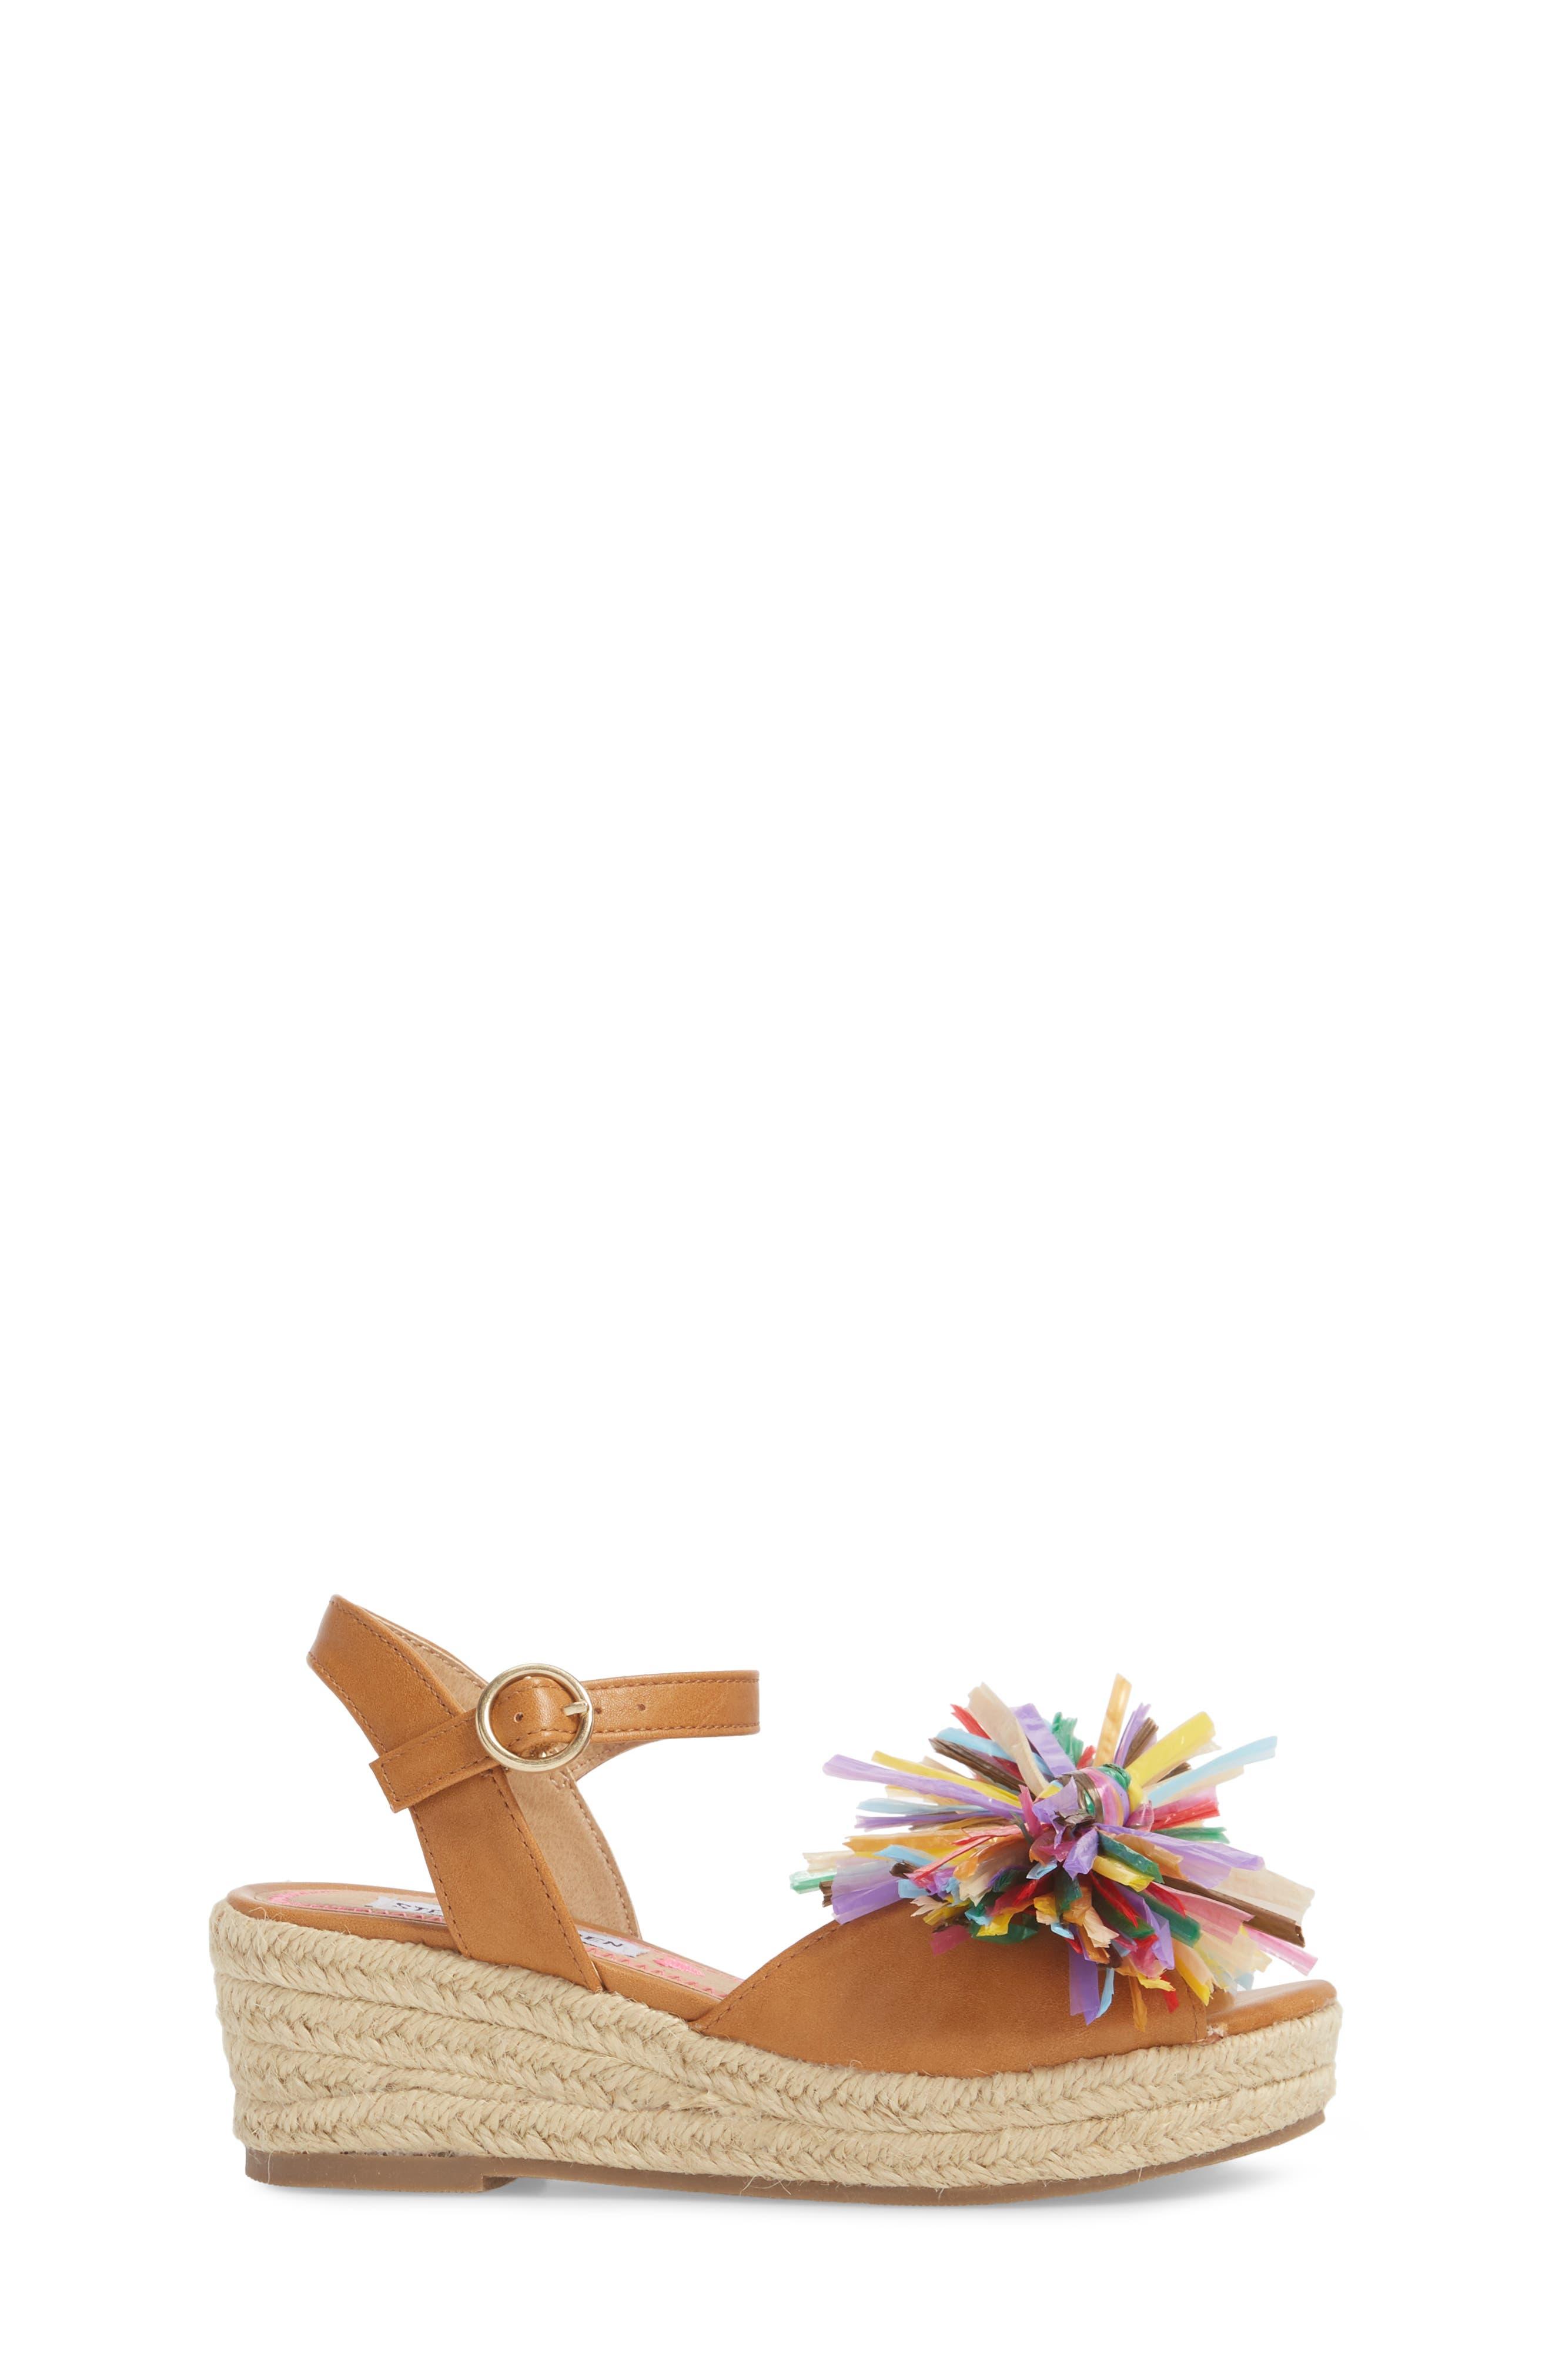 JSTRWBERI Wedge Sandal,                             Alternate thumbnail 3, color,                             200